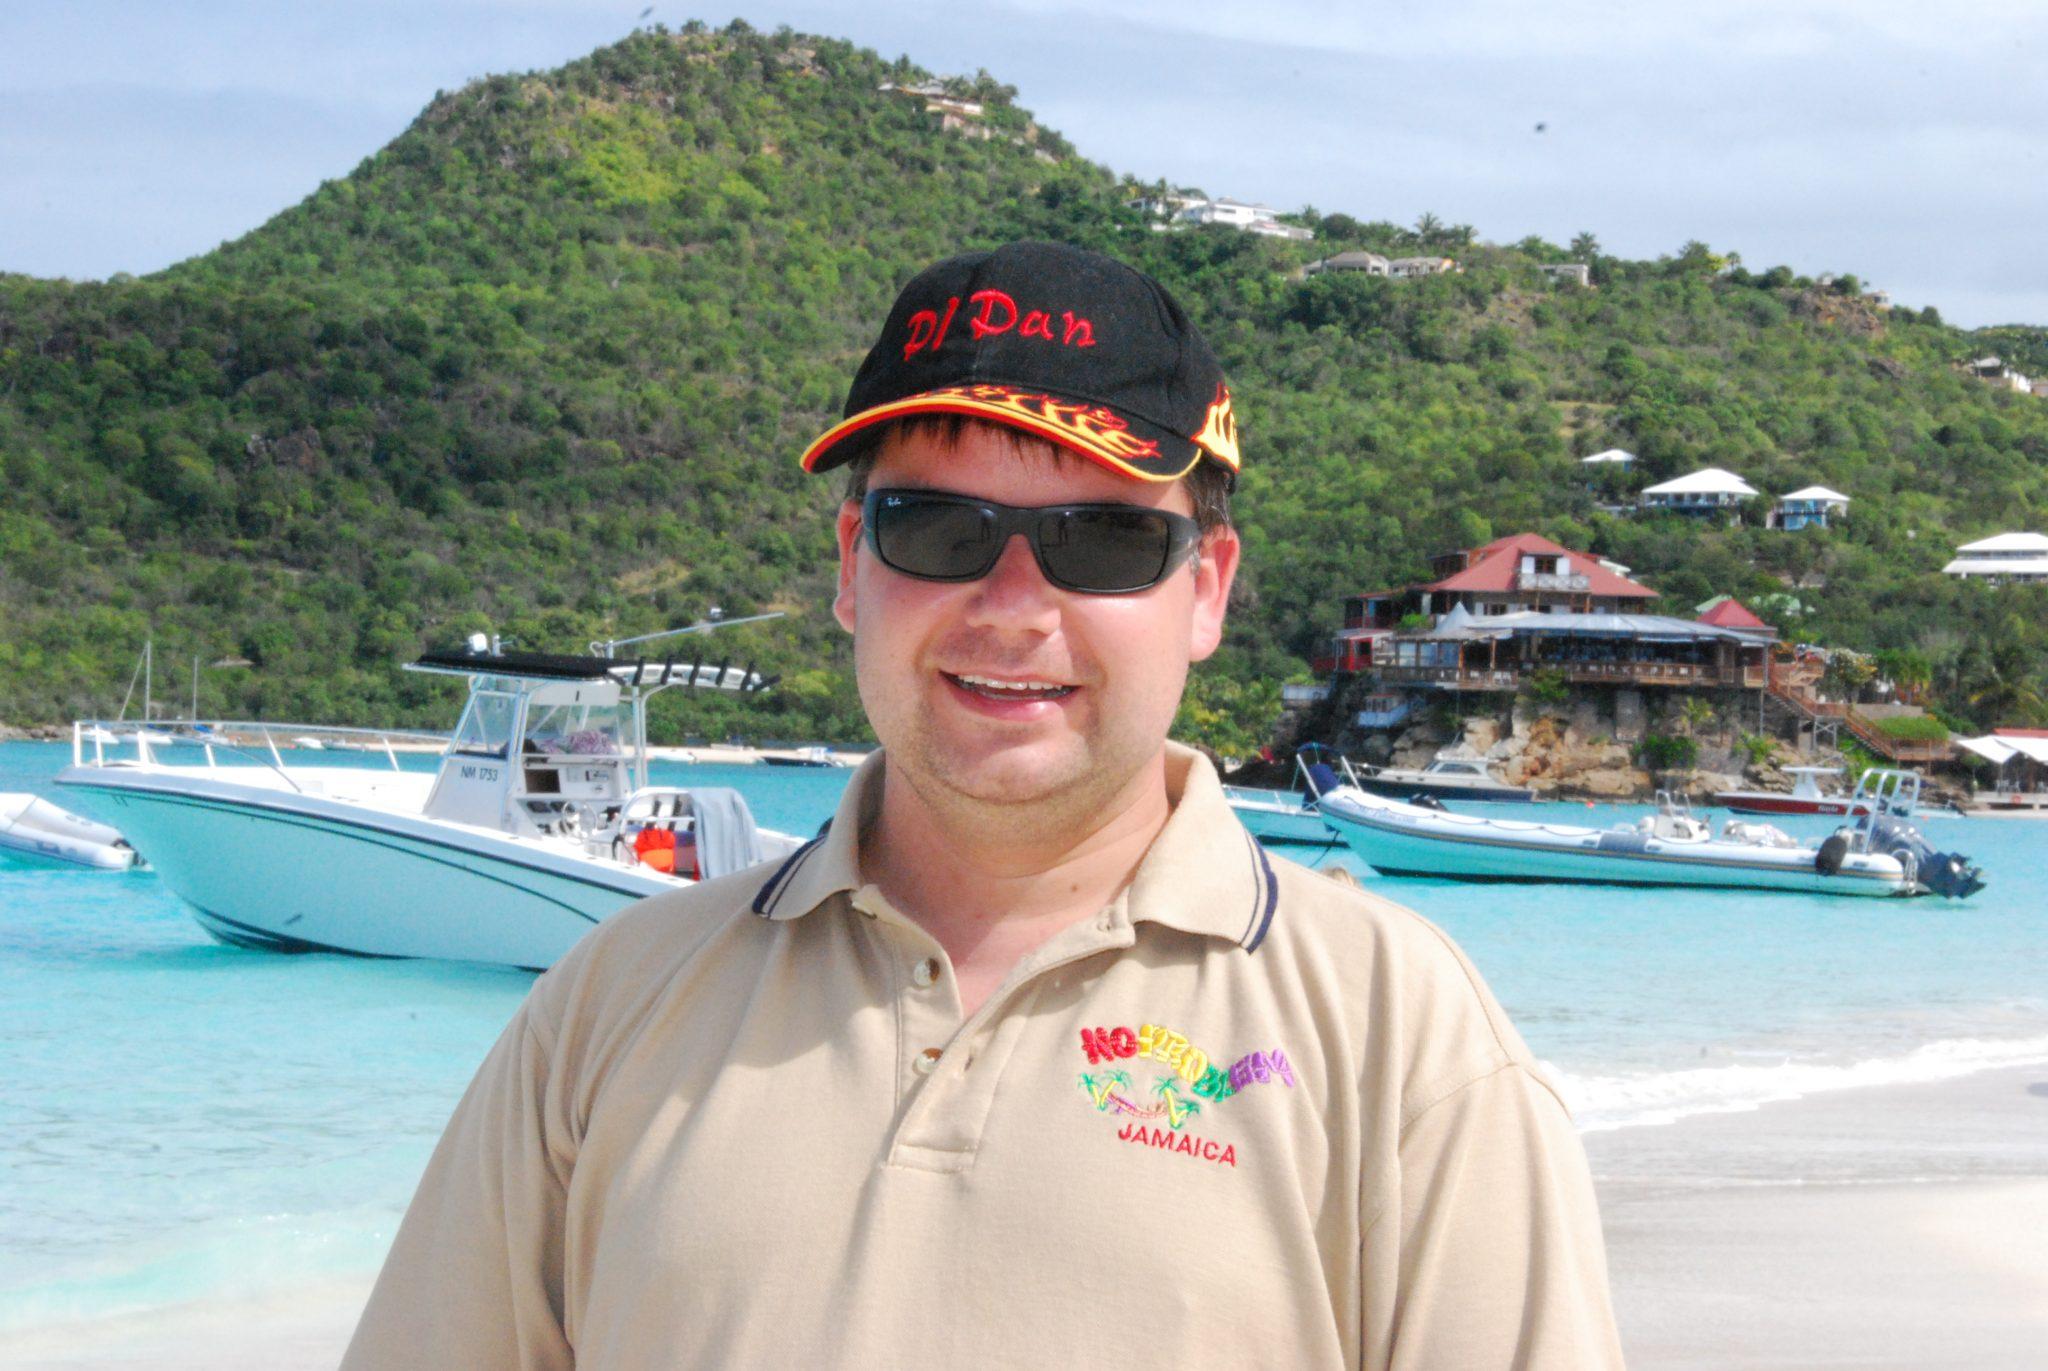 kreuzfahrtblogger-daniel-dorfer-dj-st-barth